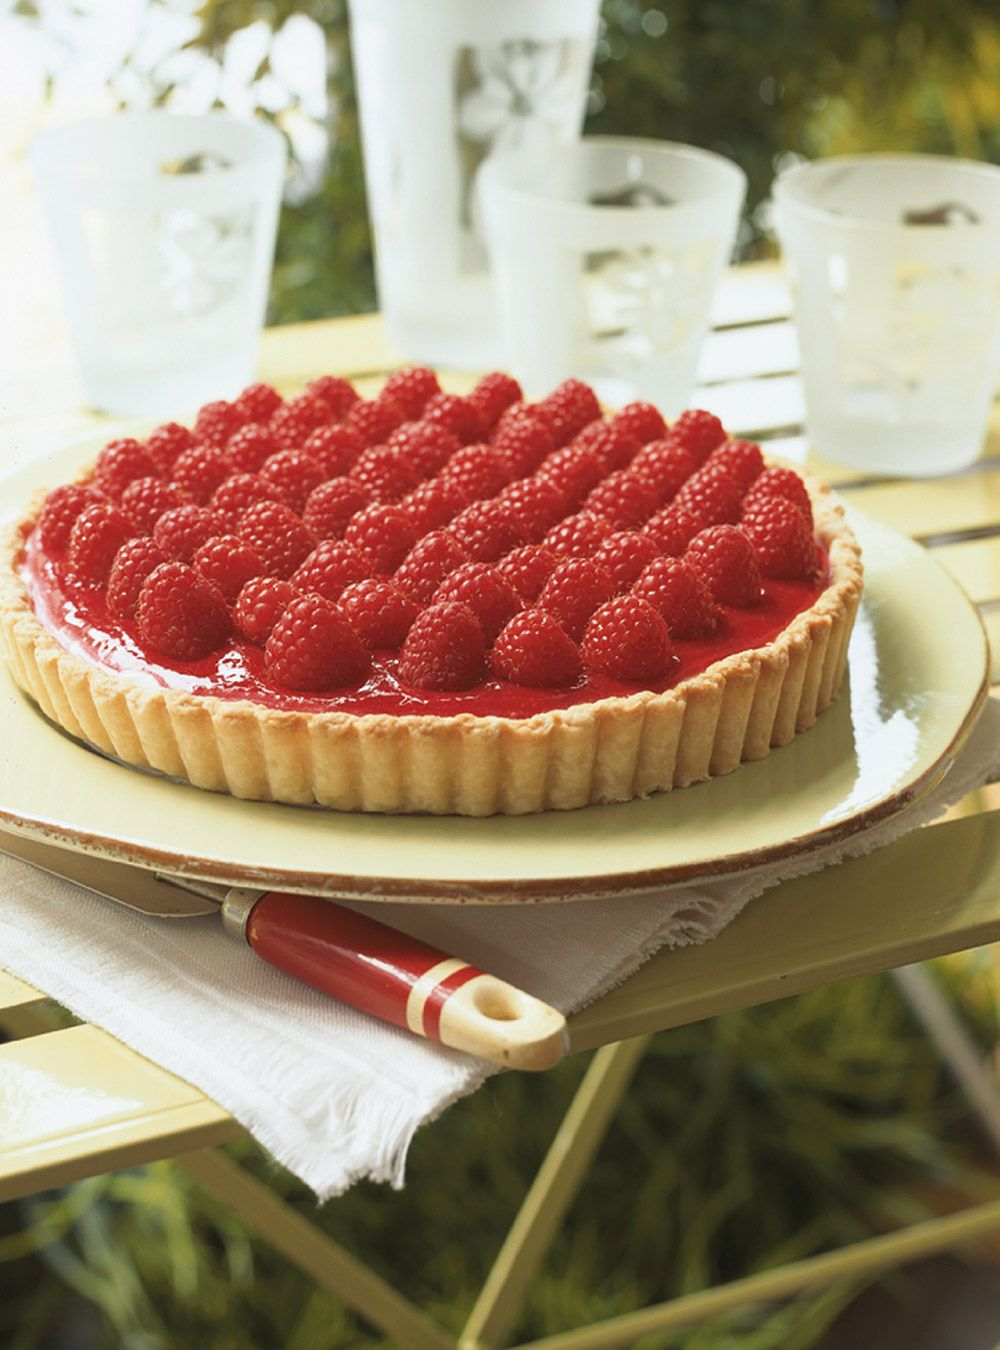 Raspberry and Mascarpone Tart